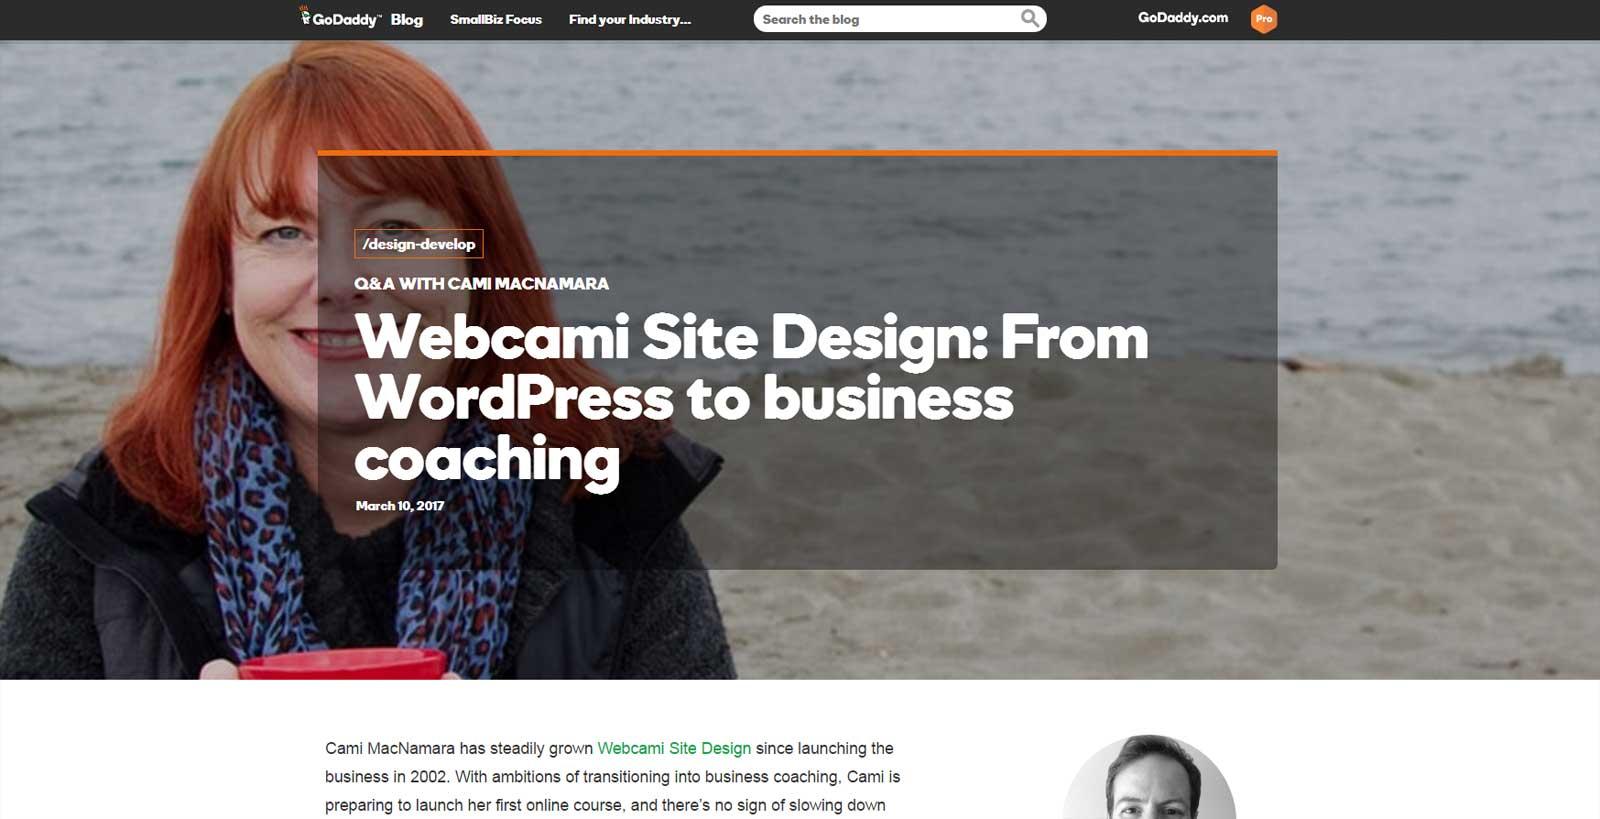 Webcami - as seen on Godaddy.com